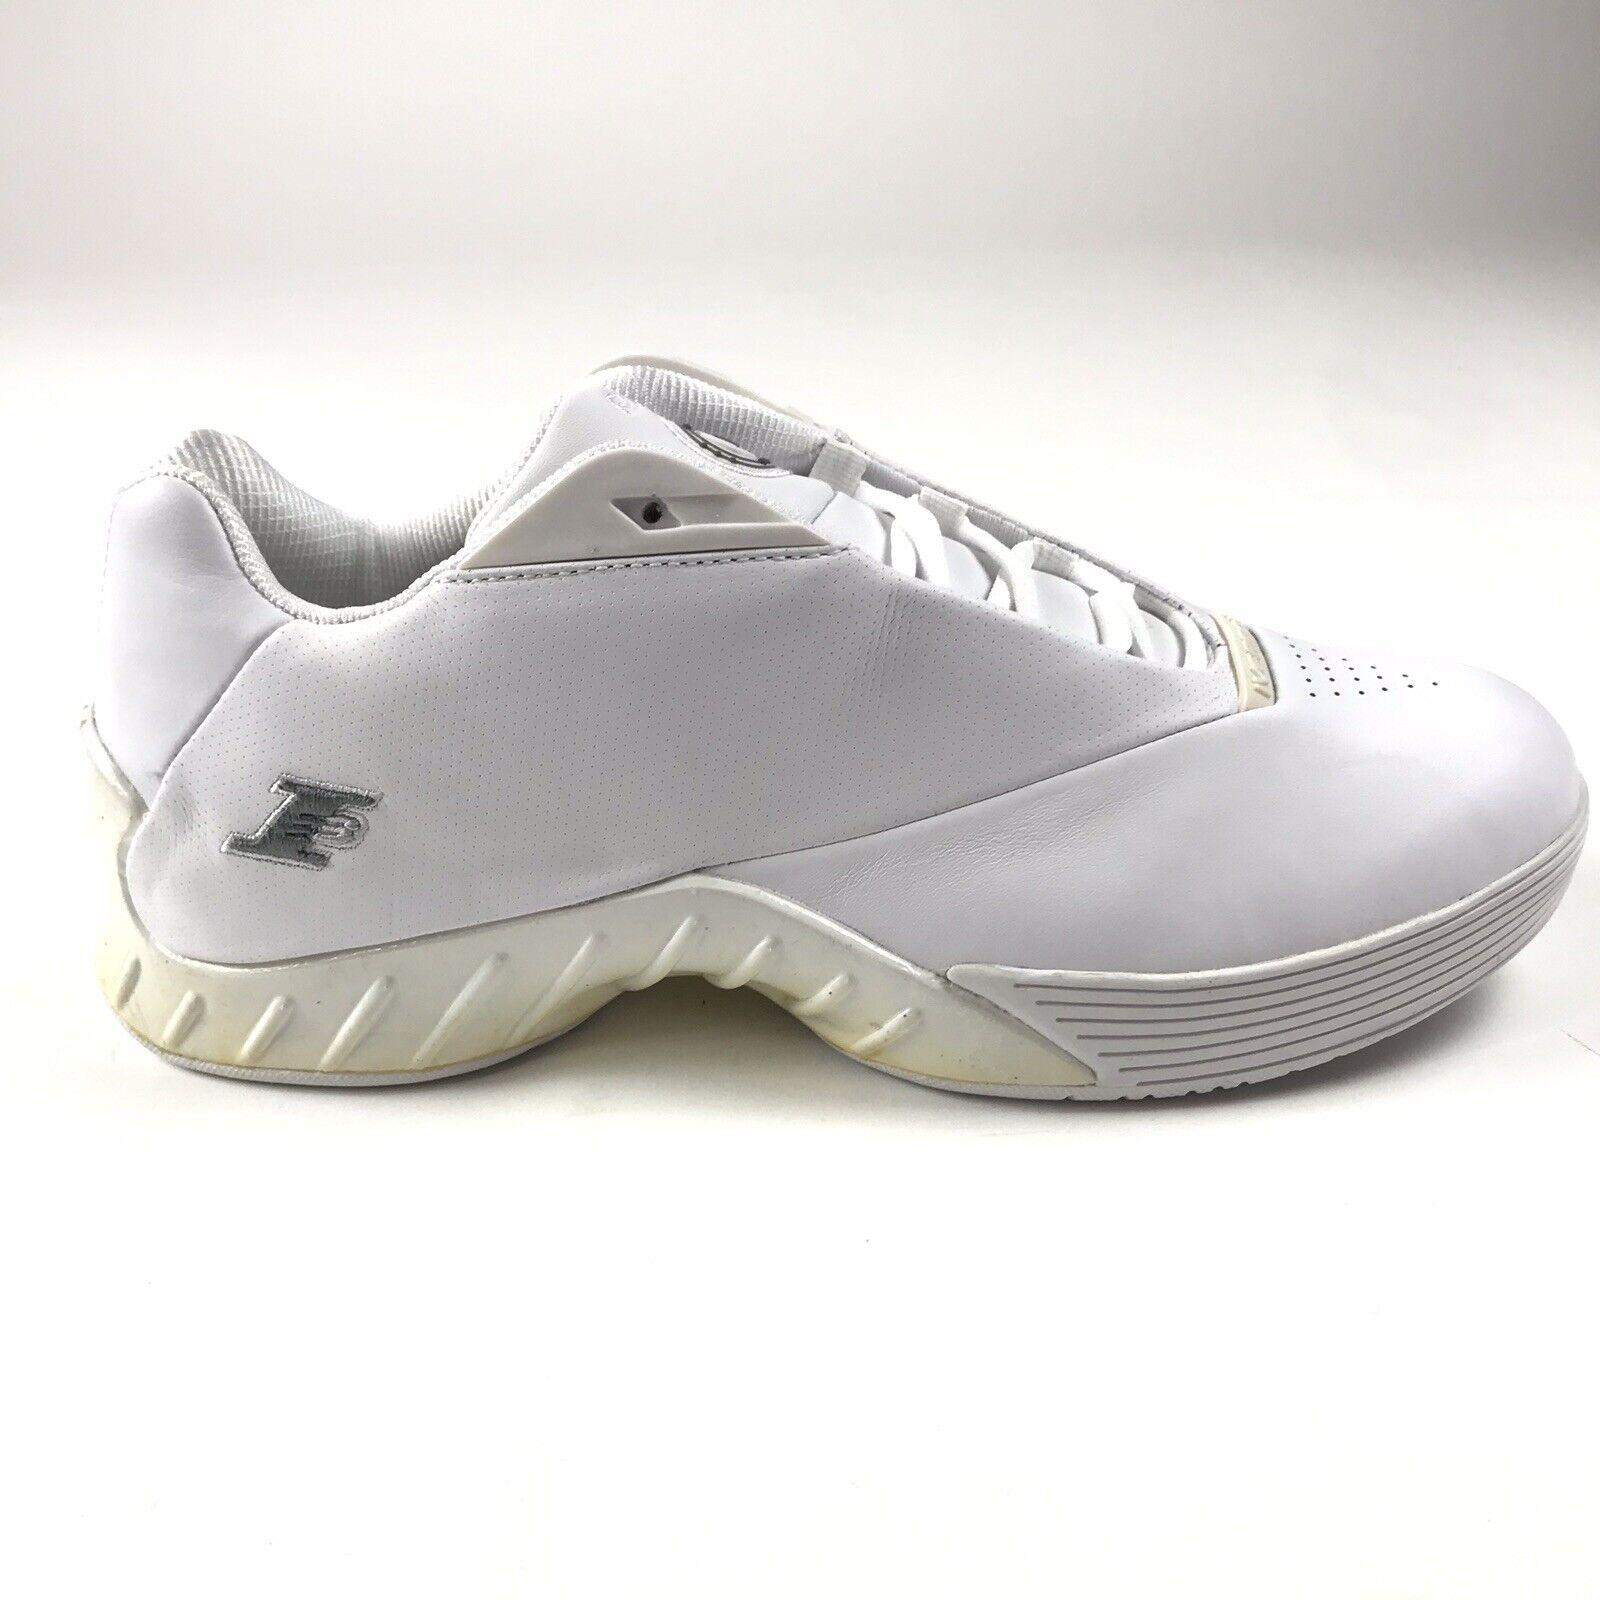 Reebok Reebok Reebok RBK I3 Playoff Low II 2 Uomo 10 bianca Basketball scarpe Iverson 4-95322 977d19